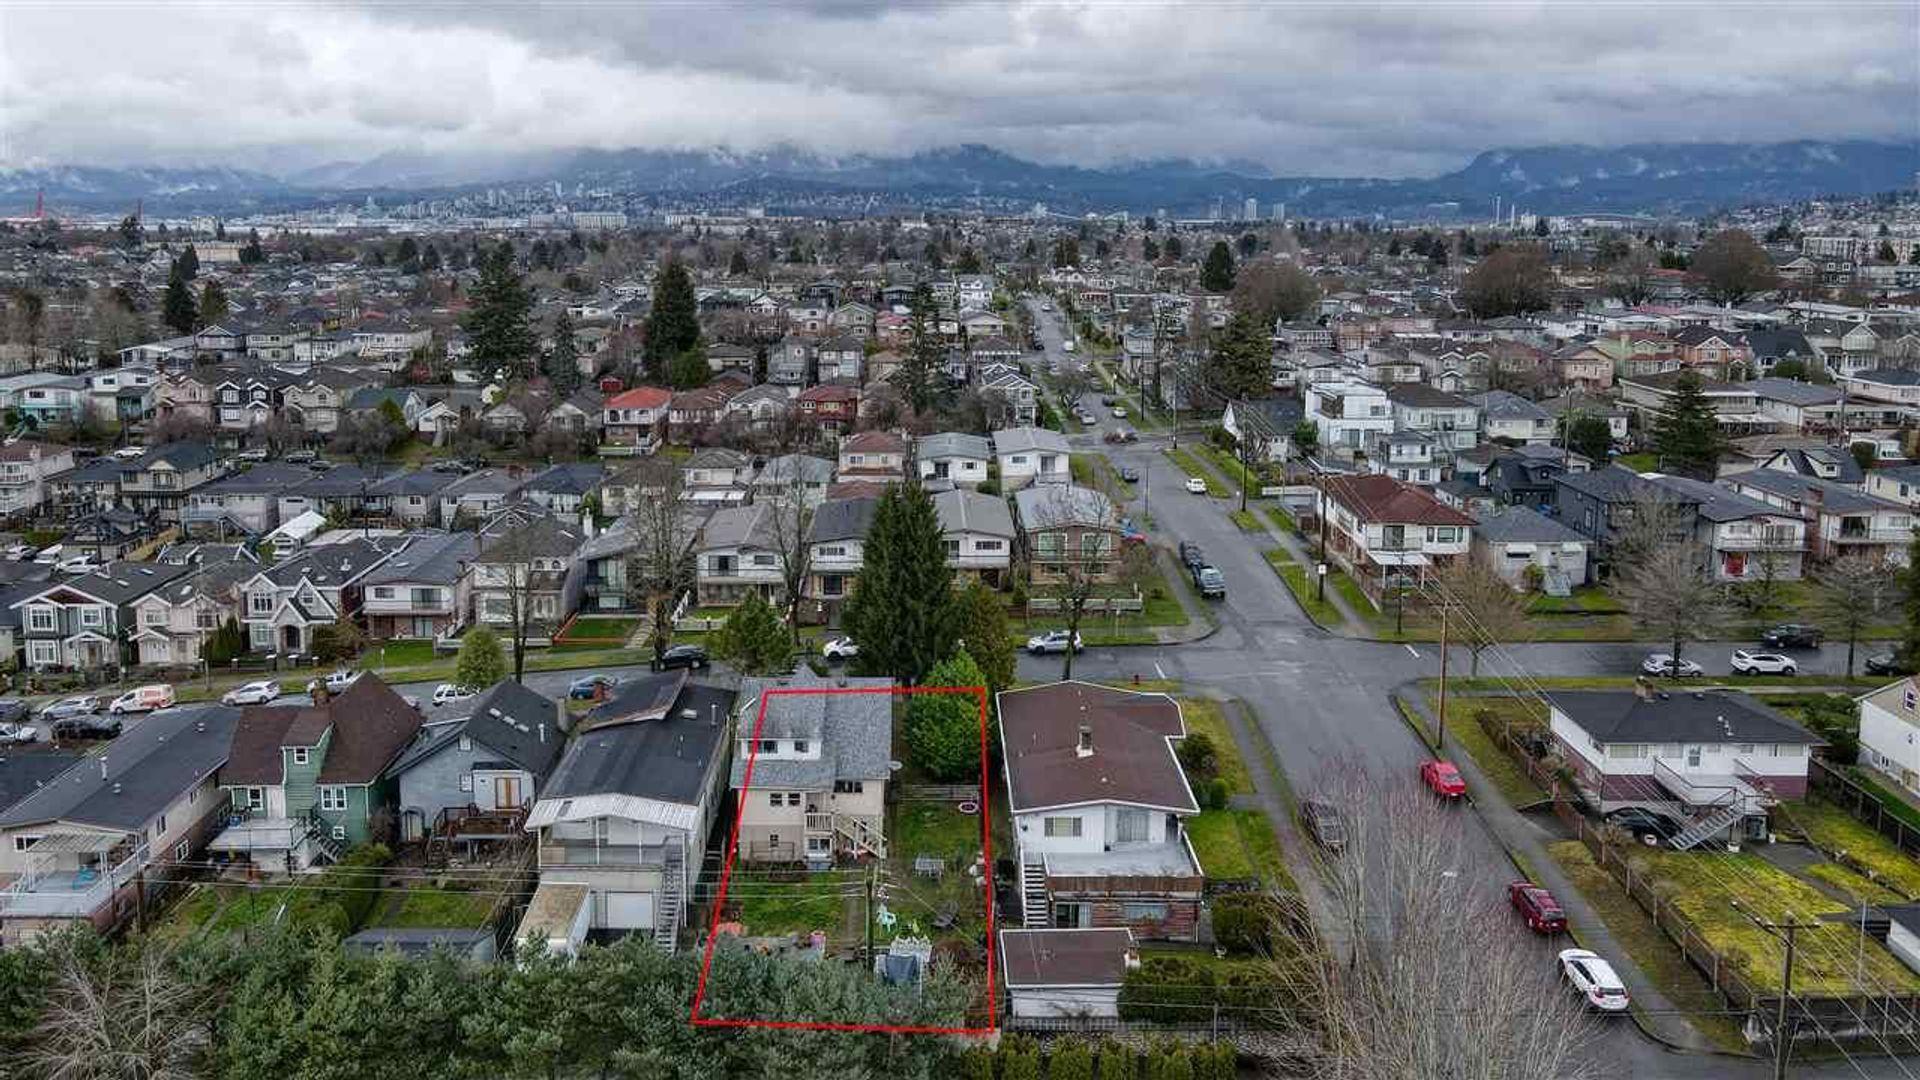 2684-e-8th-avenue-renfrew-ve-vancouver-east-02 at 2684 E 8th Avenue, Renfrew VE, Vancouver East